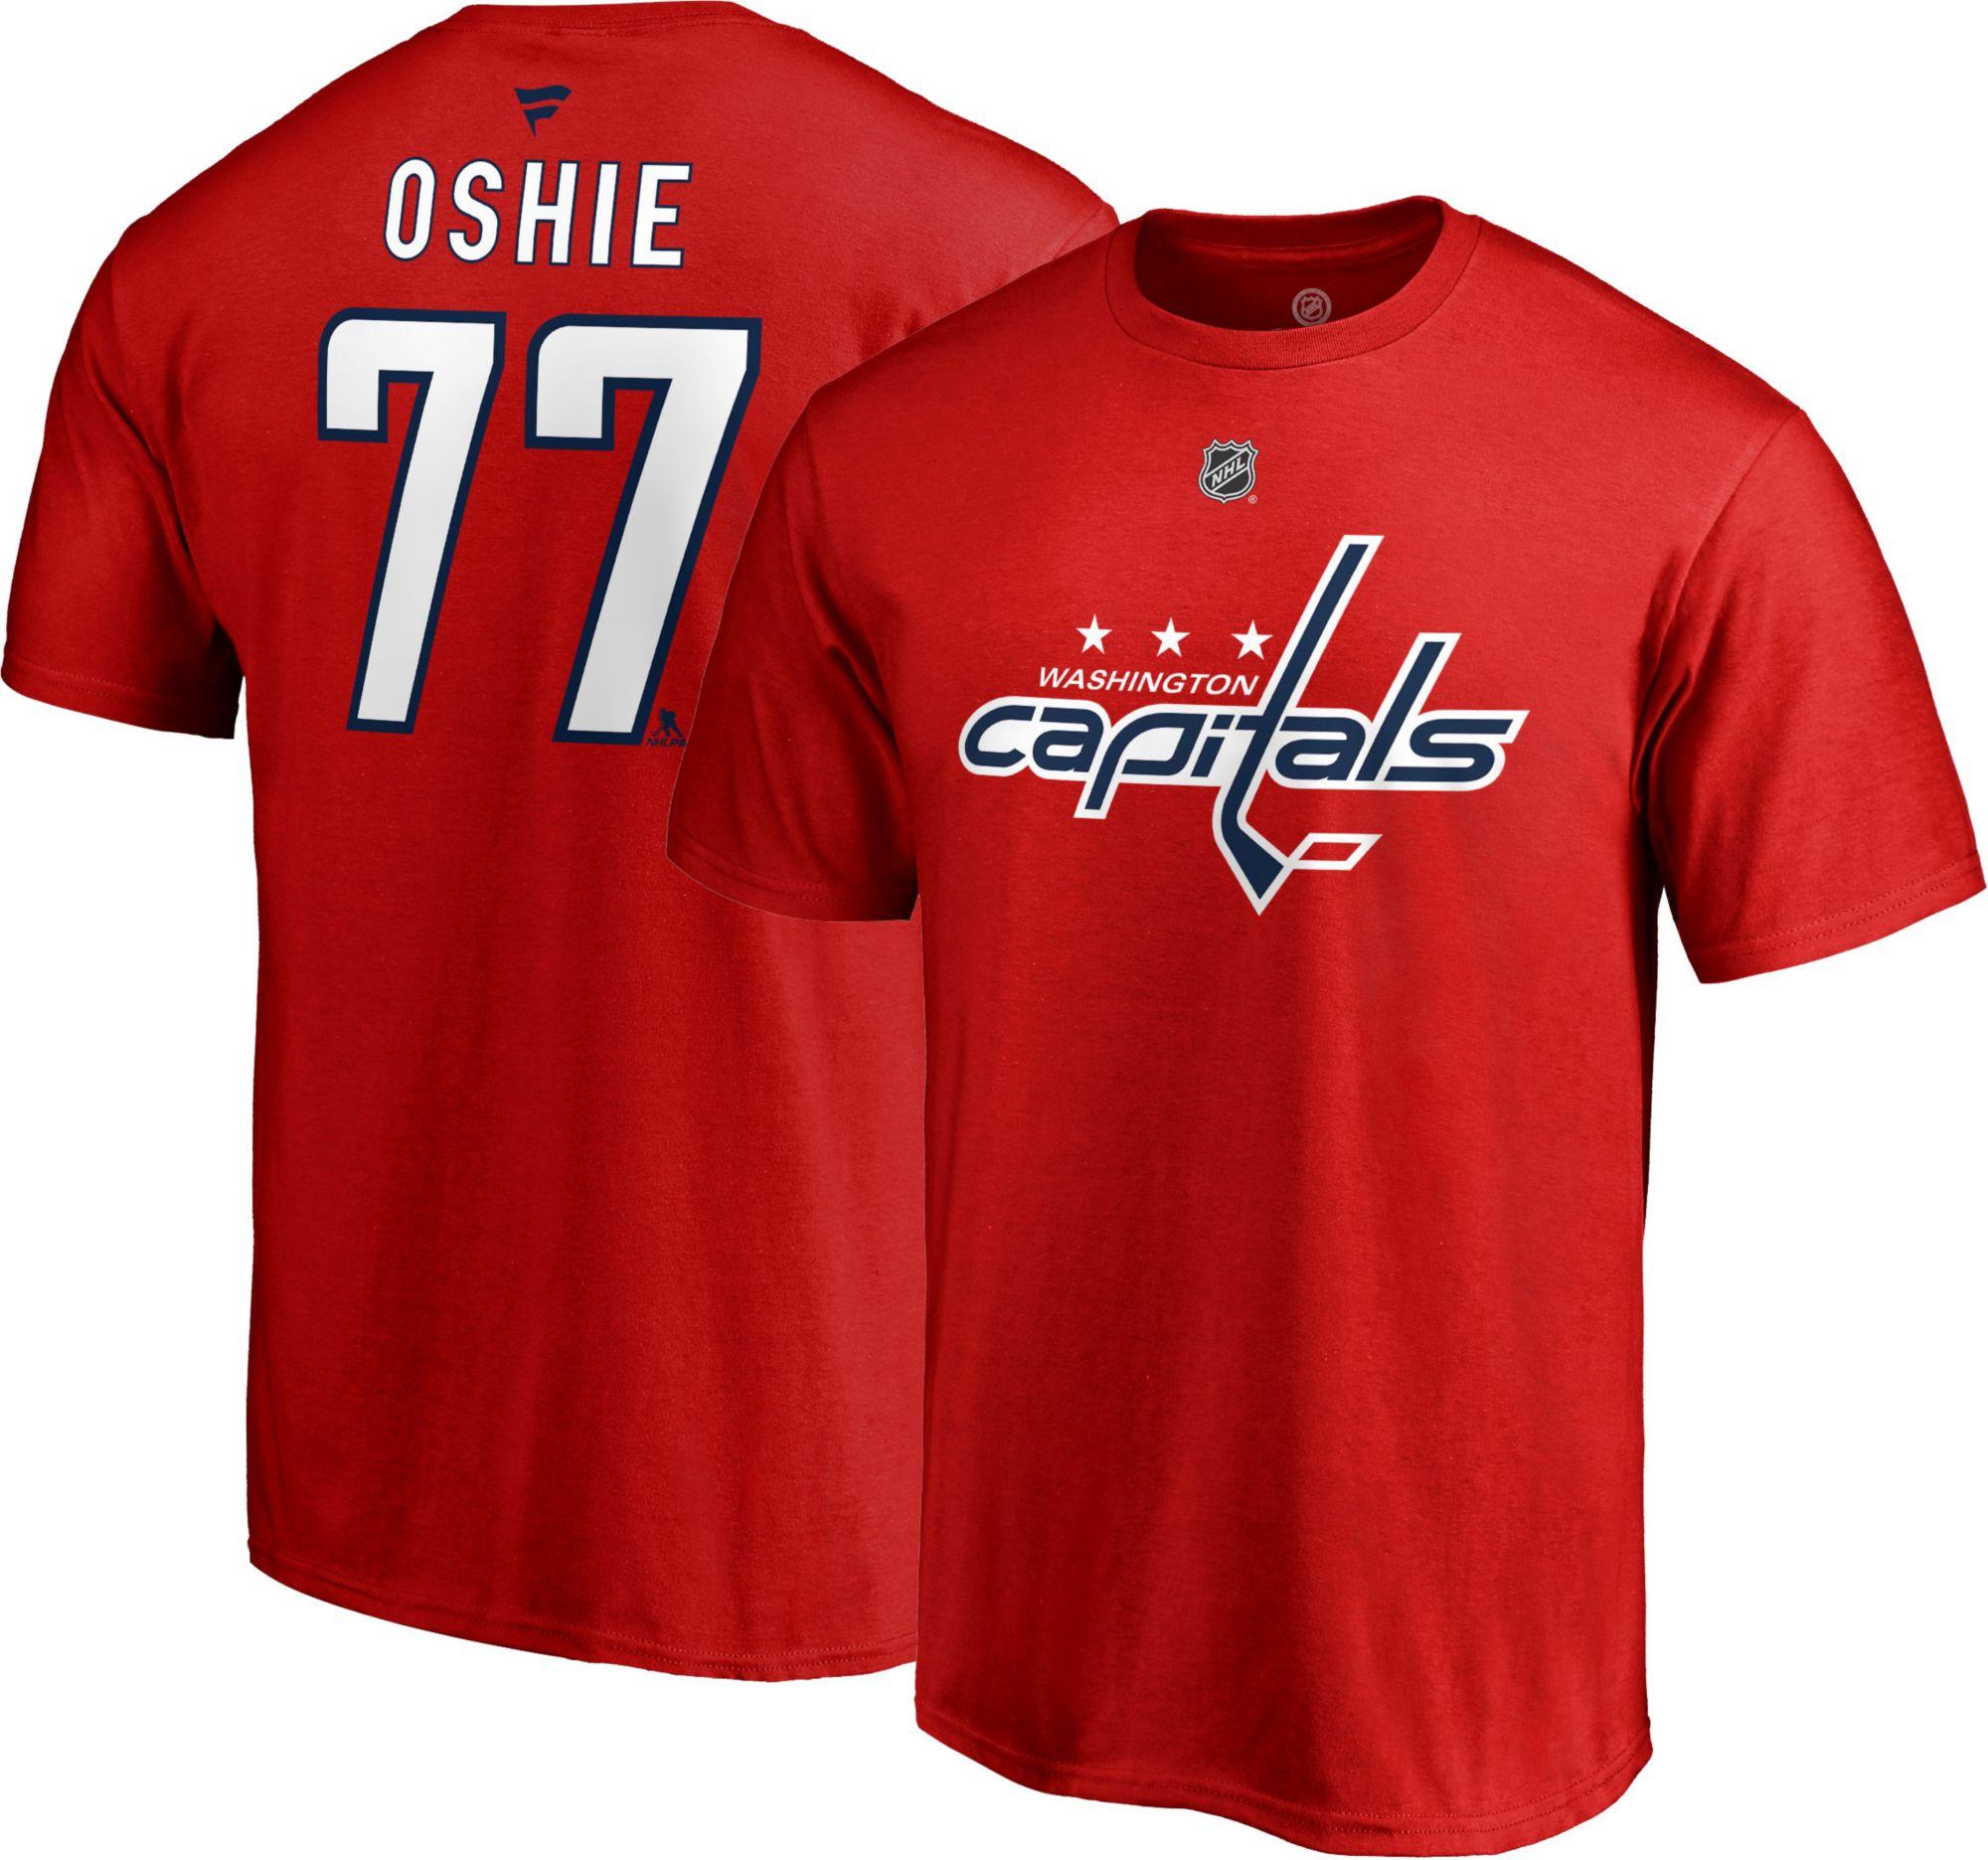 ... australia nhl mens washington capitals t.j. oshie 77 red player t shirt  39d53 b04ff d642bd017